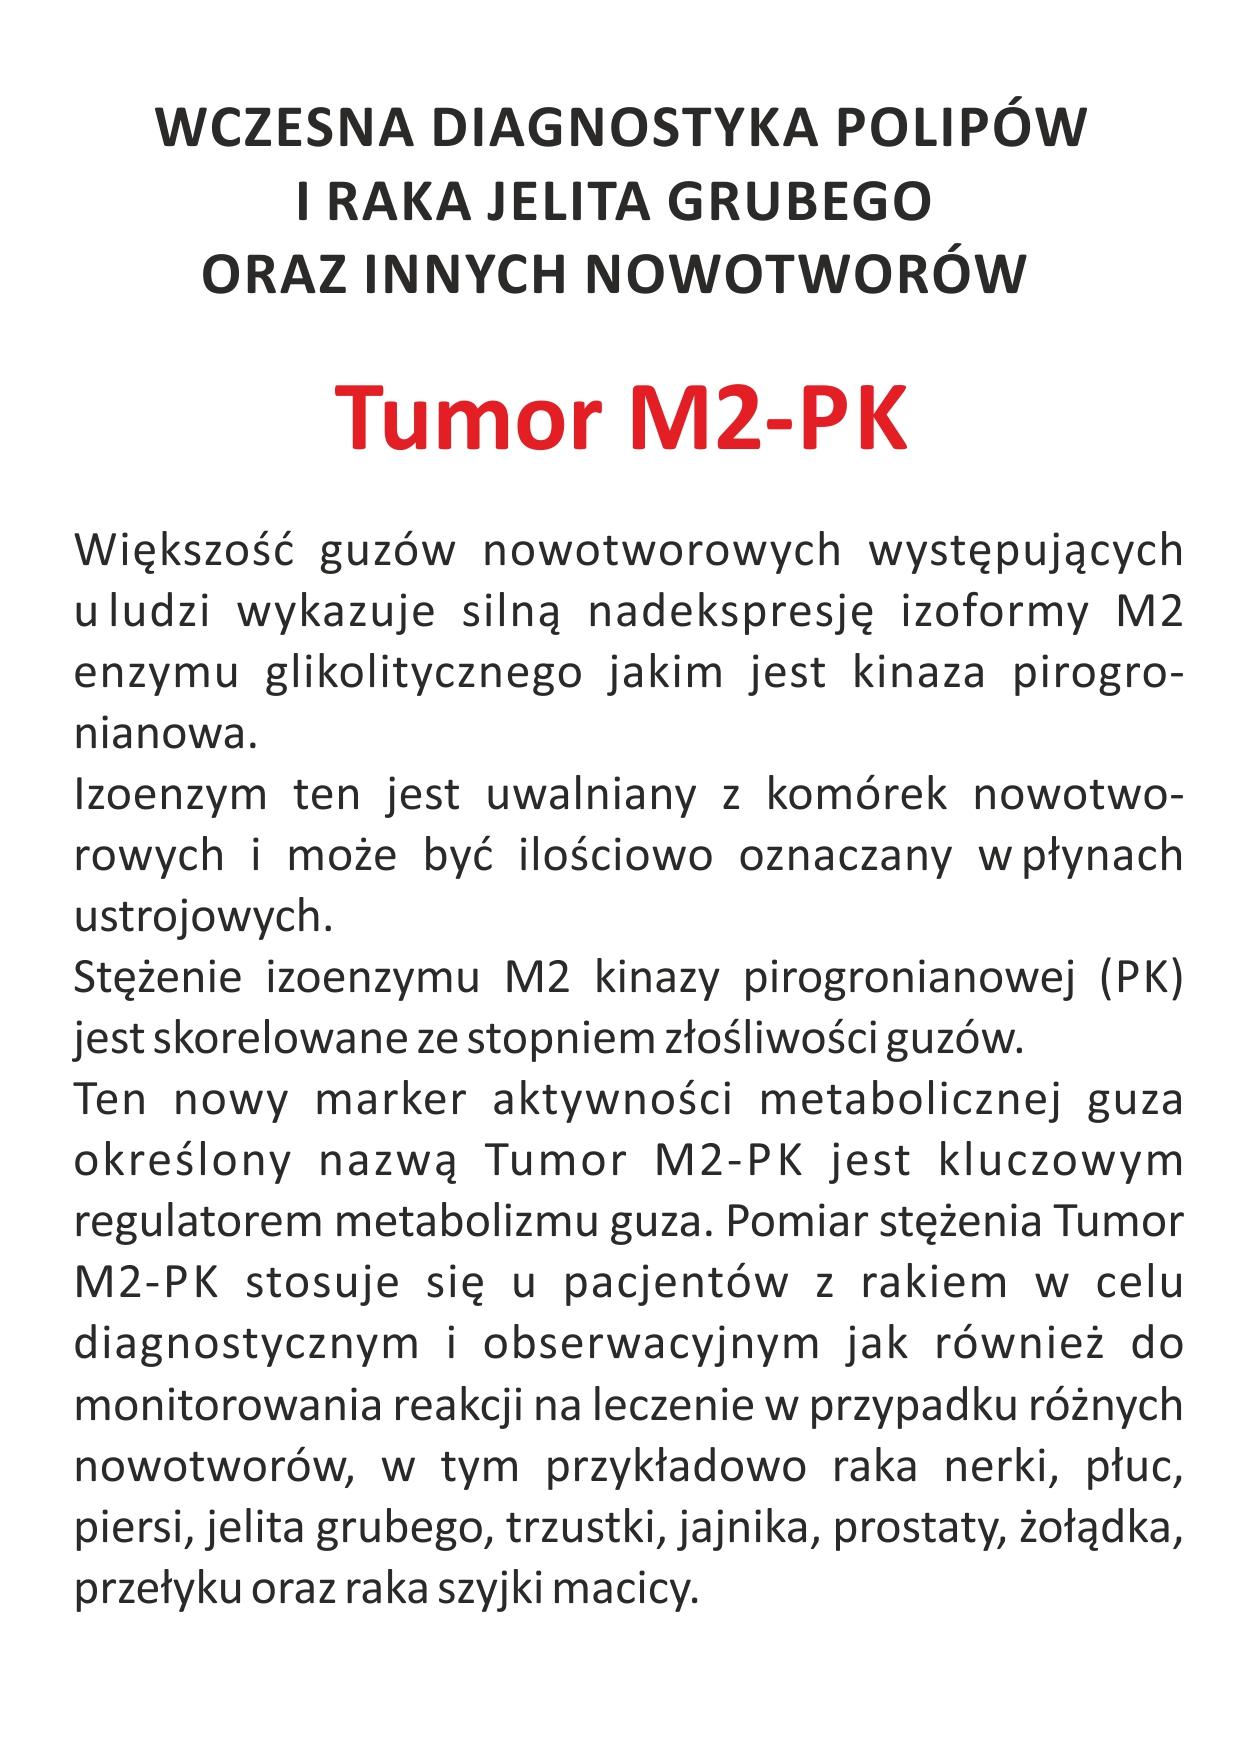 LabTest ulotka A6 Tumor M2-PK